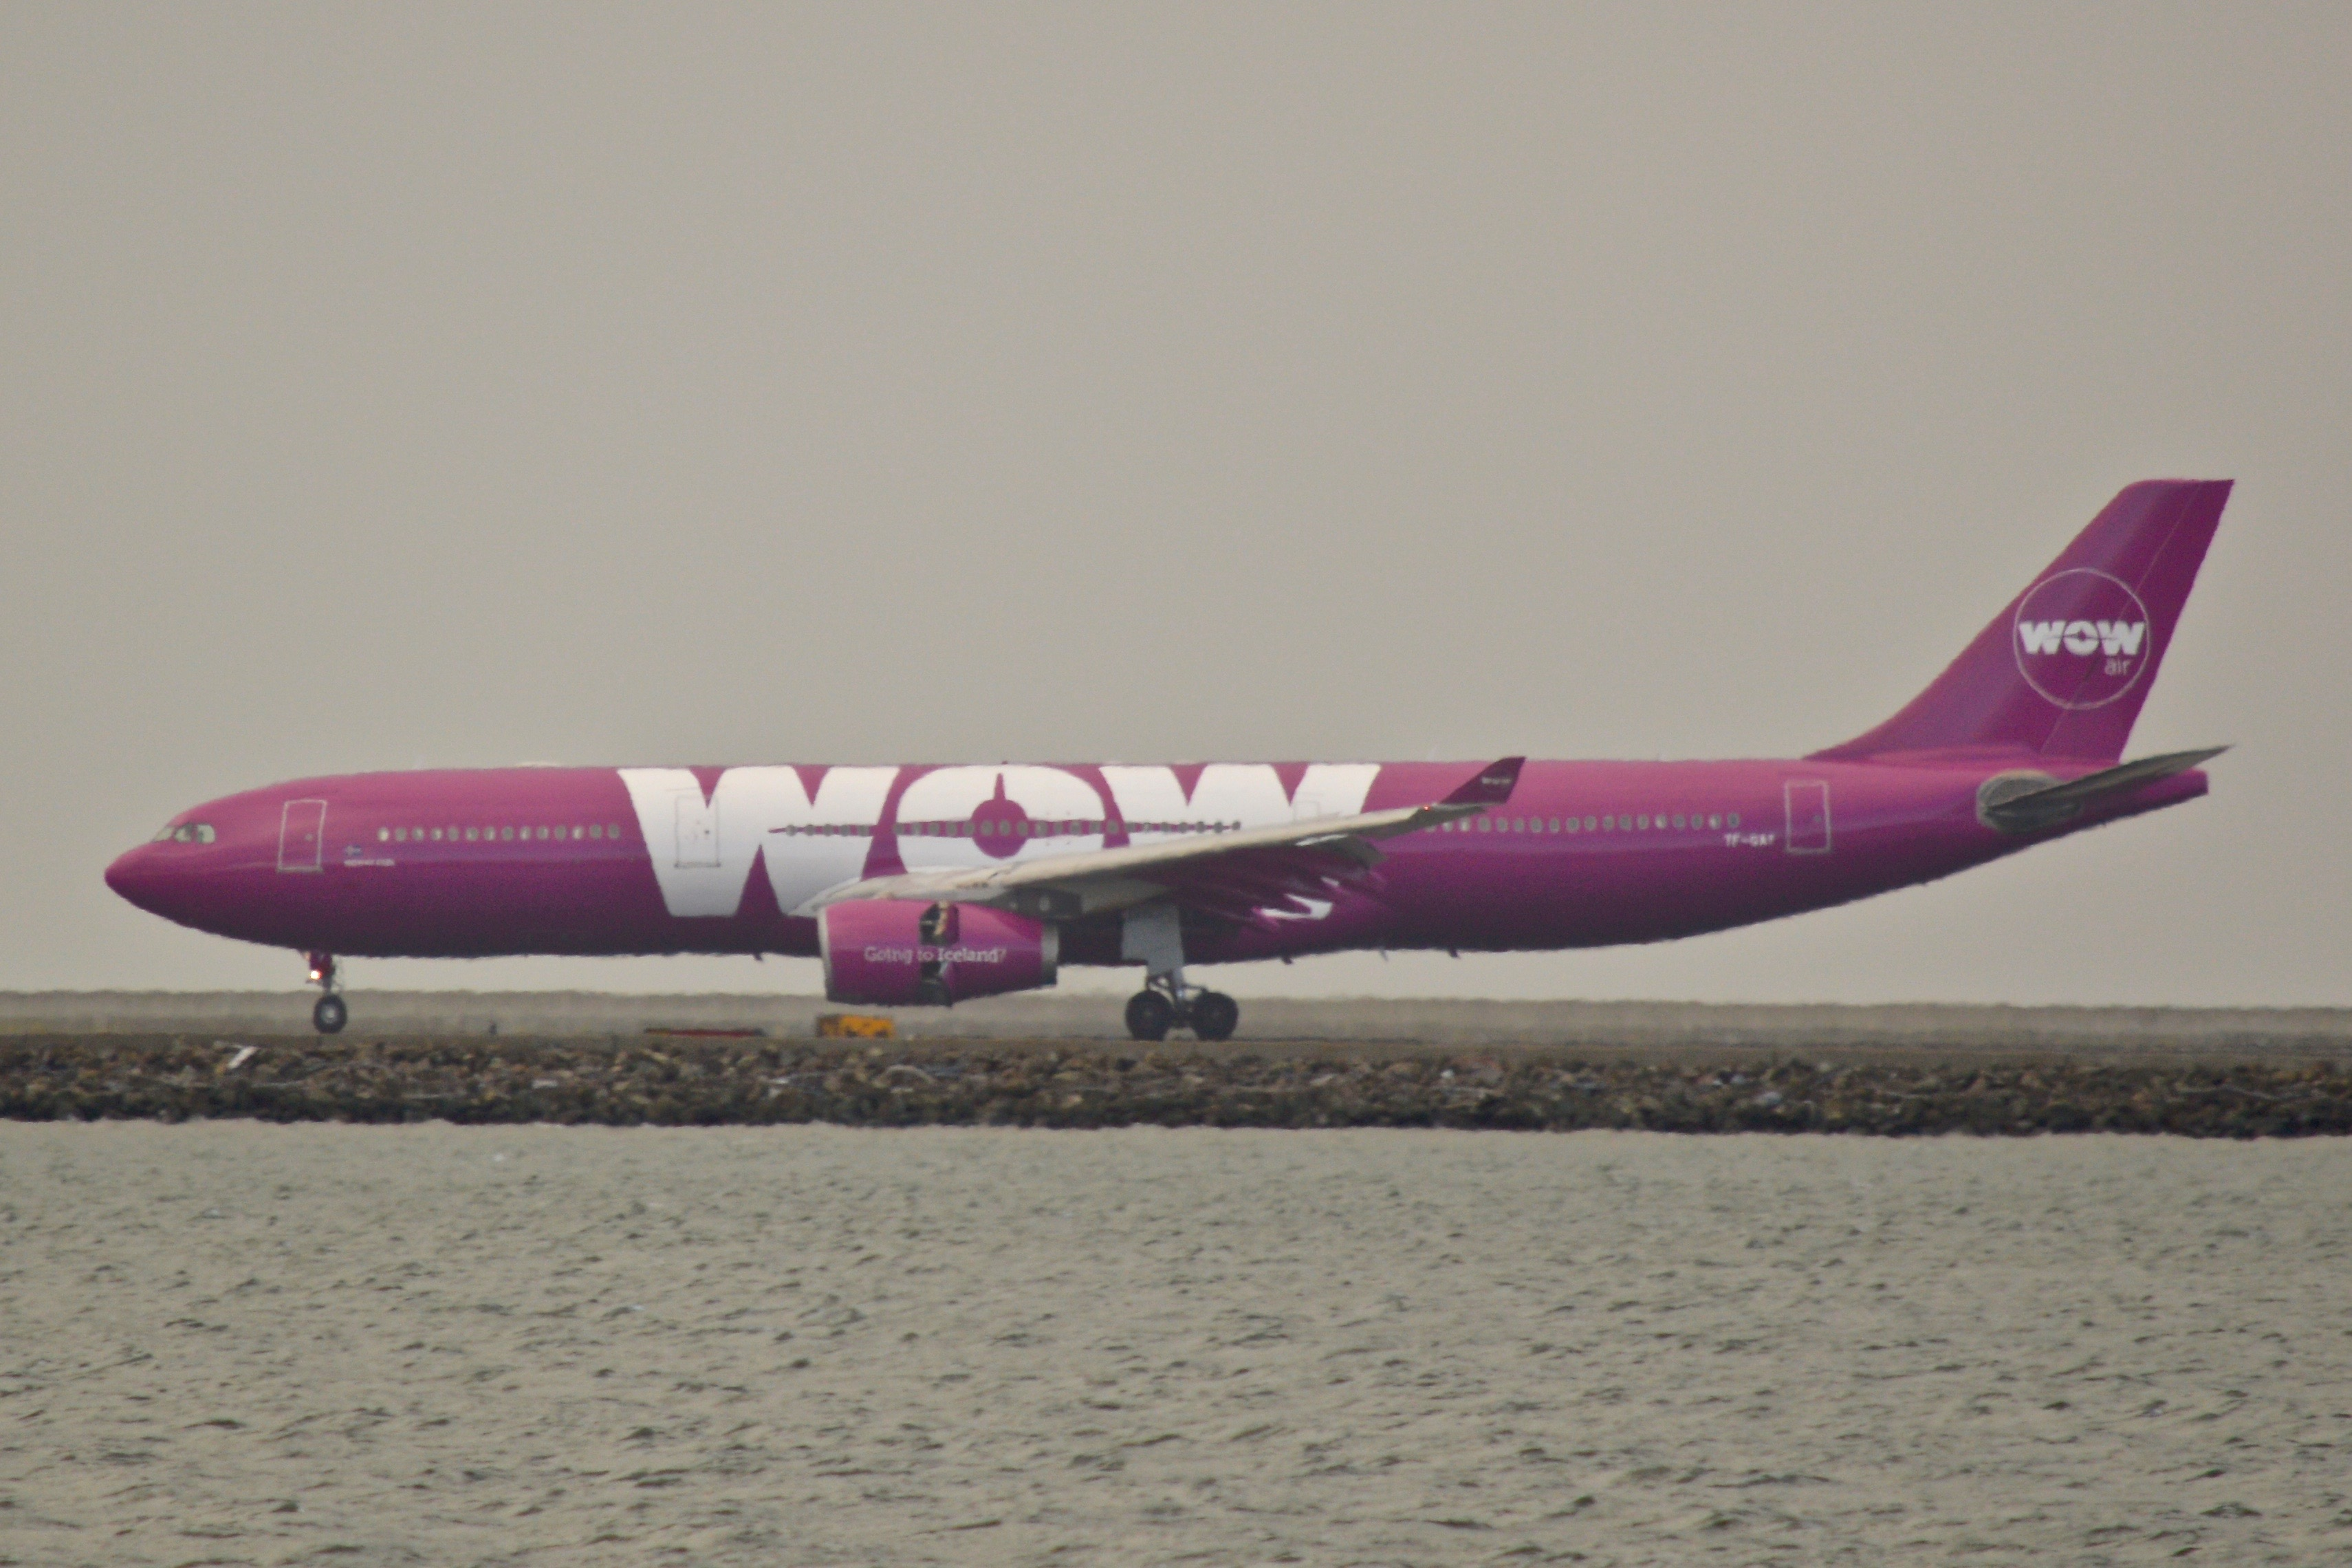 File:WOW Air, Airbus A330 Profile, Soft Light! DSC 0529